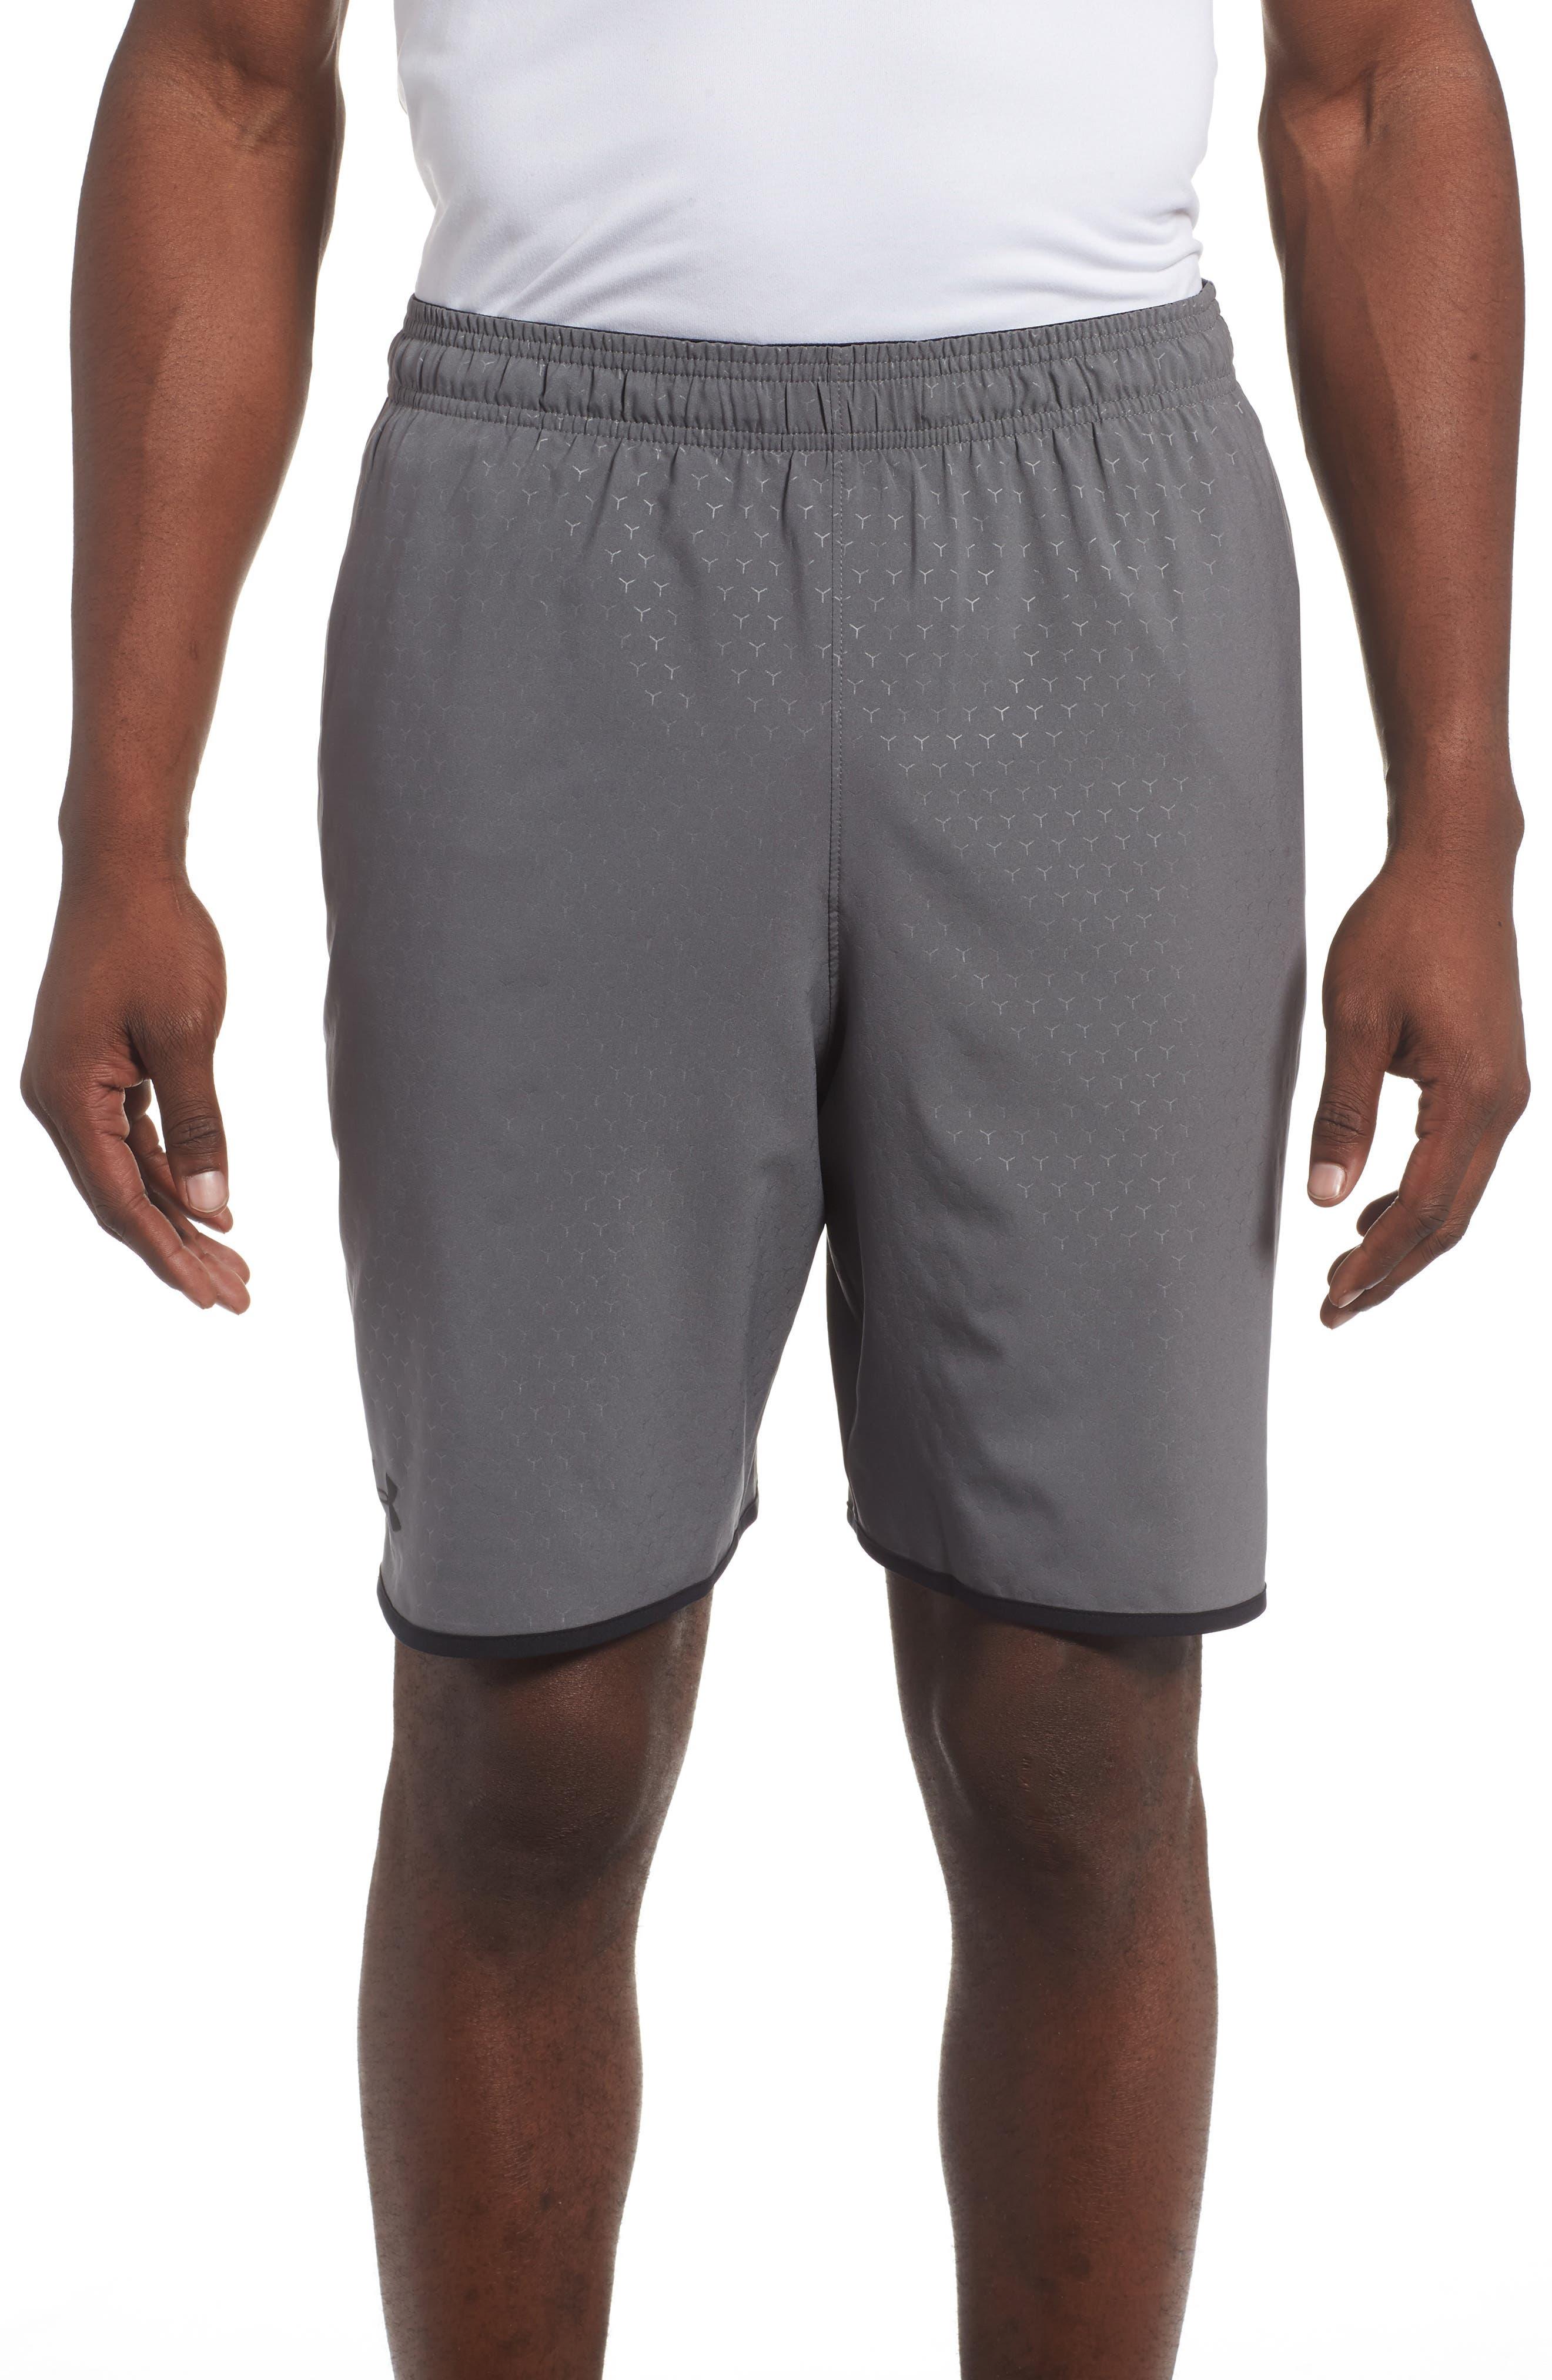 Qualifier Training Shorts,                             Main thumbnail 1, color,                             Graphite/ Black